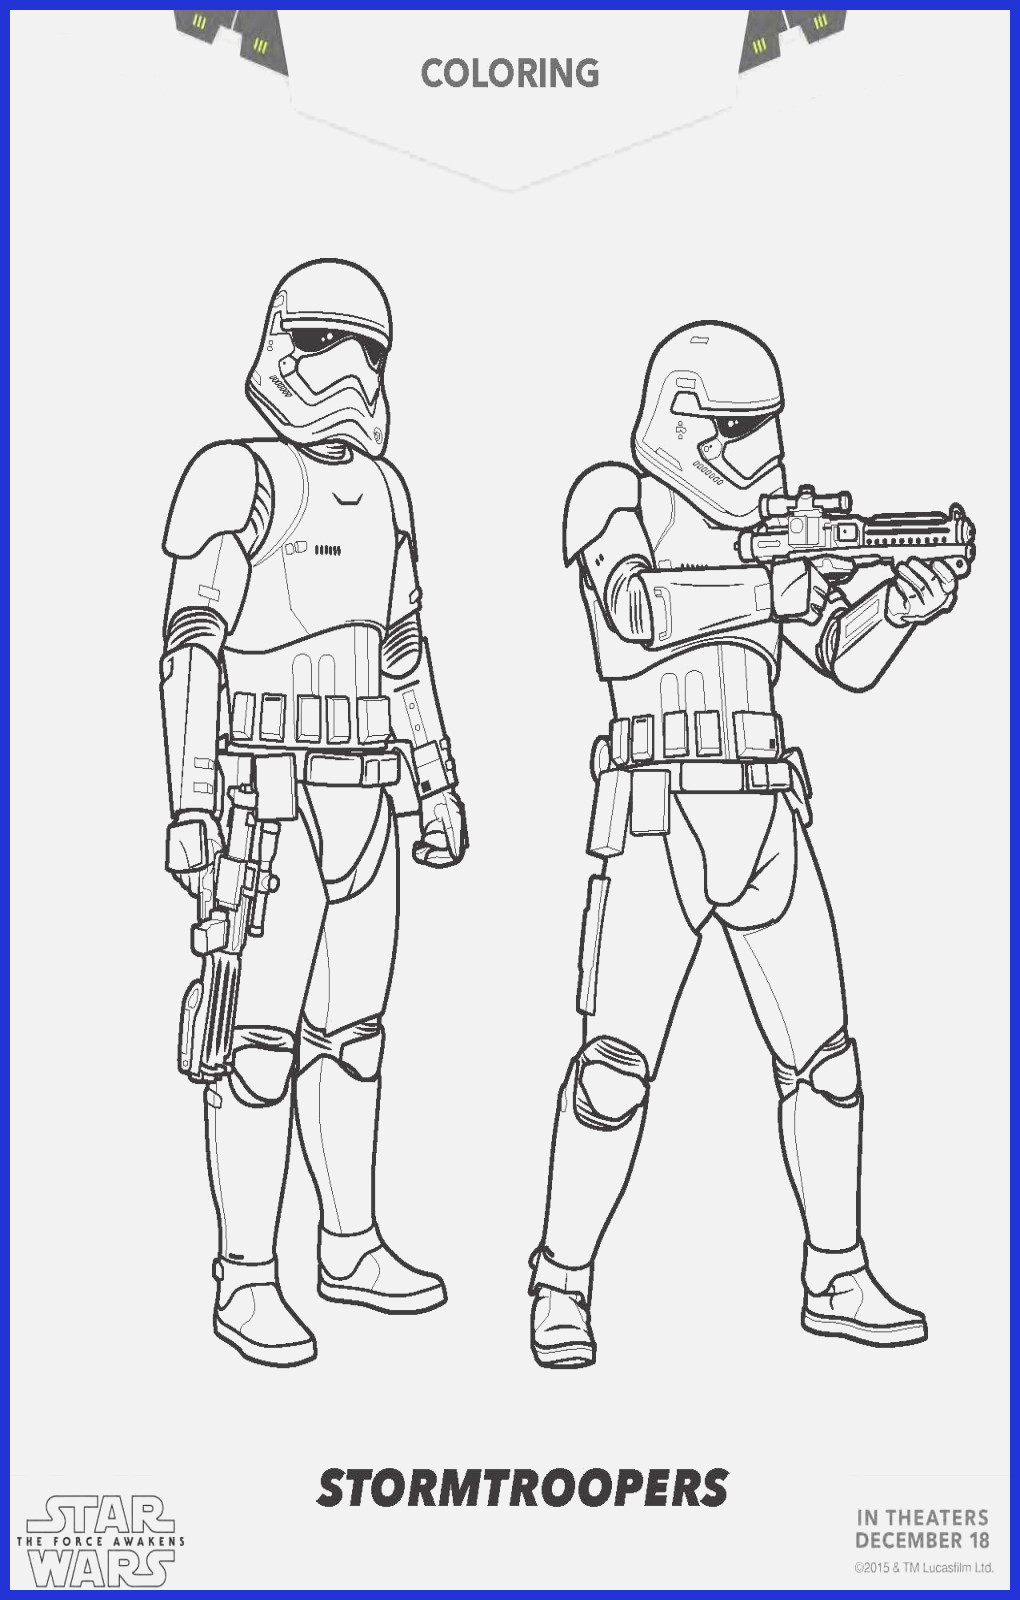 Star Wars Ausmalbilder Darth Maul Genial Darth Maul Coloring Page Lego Star Wars Figuren Ausmalbilder Best Fotos